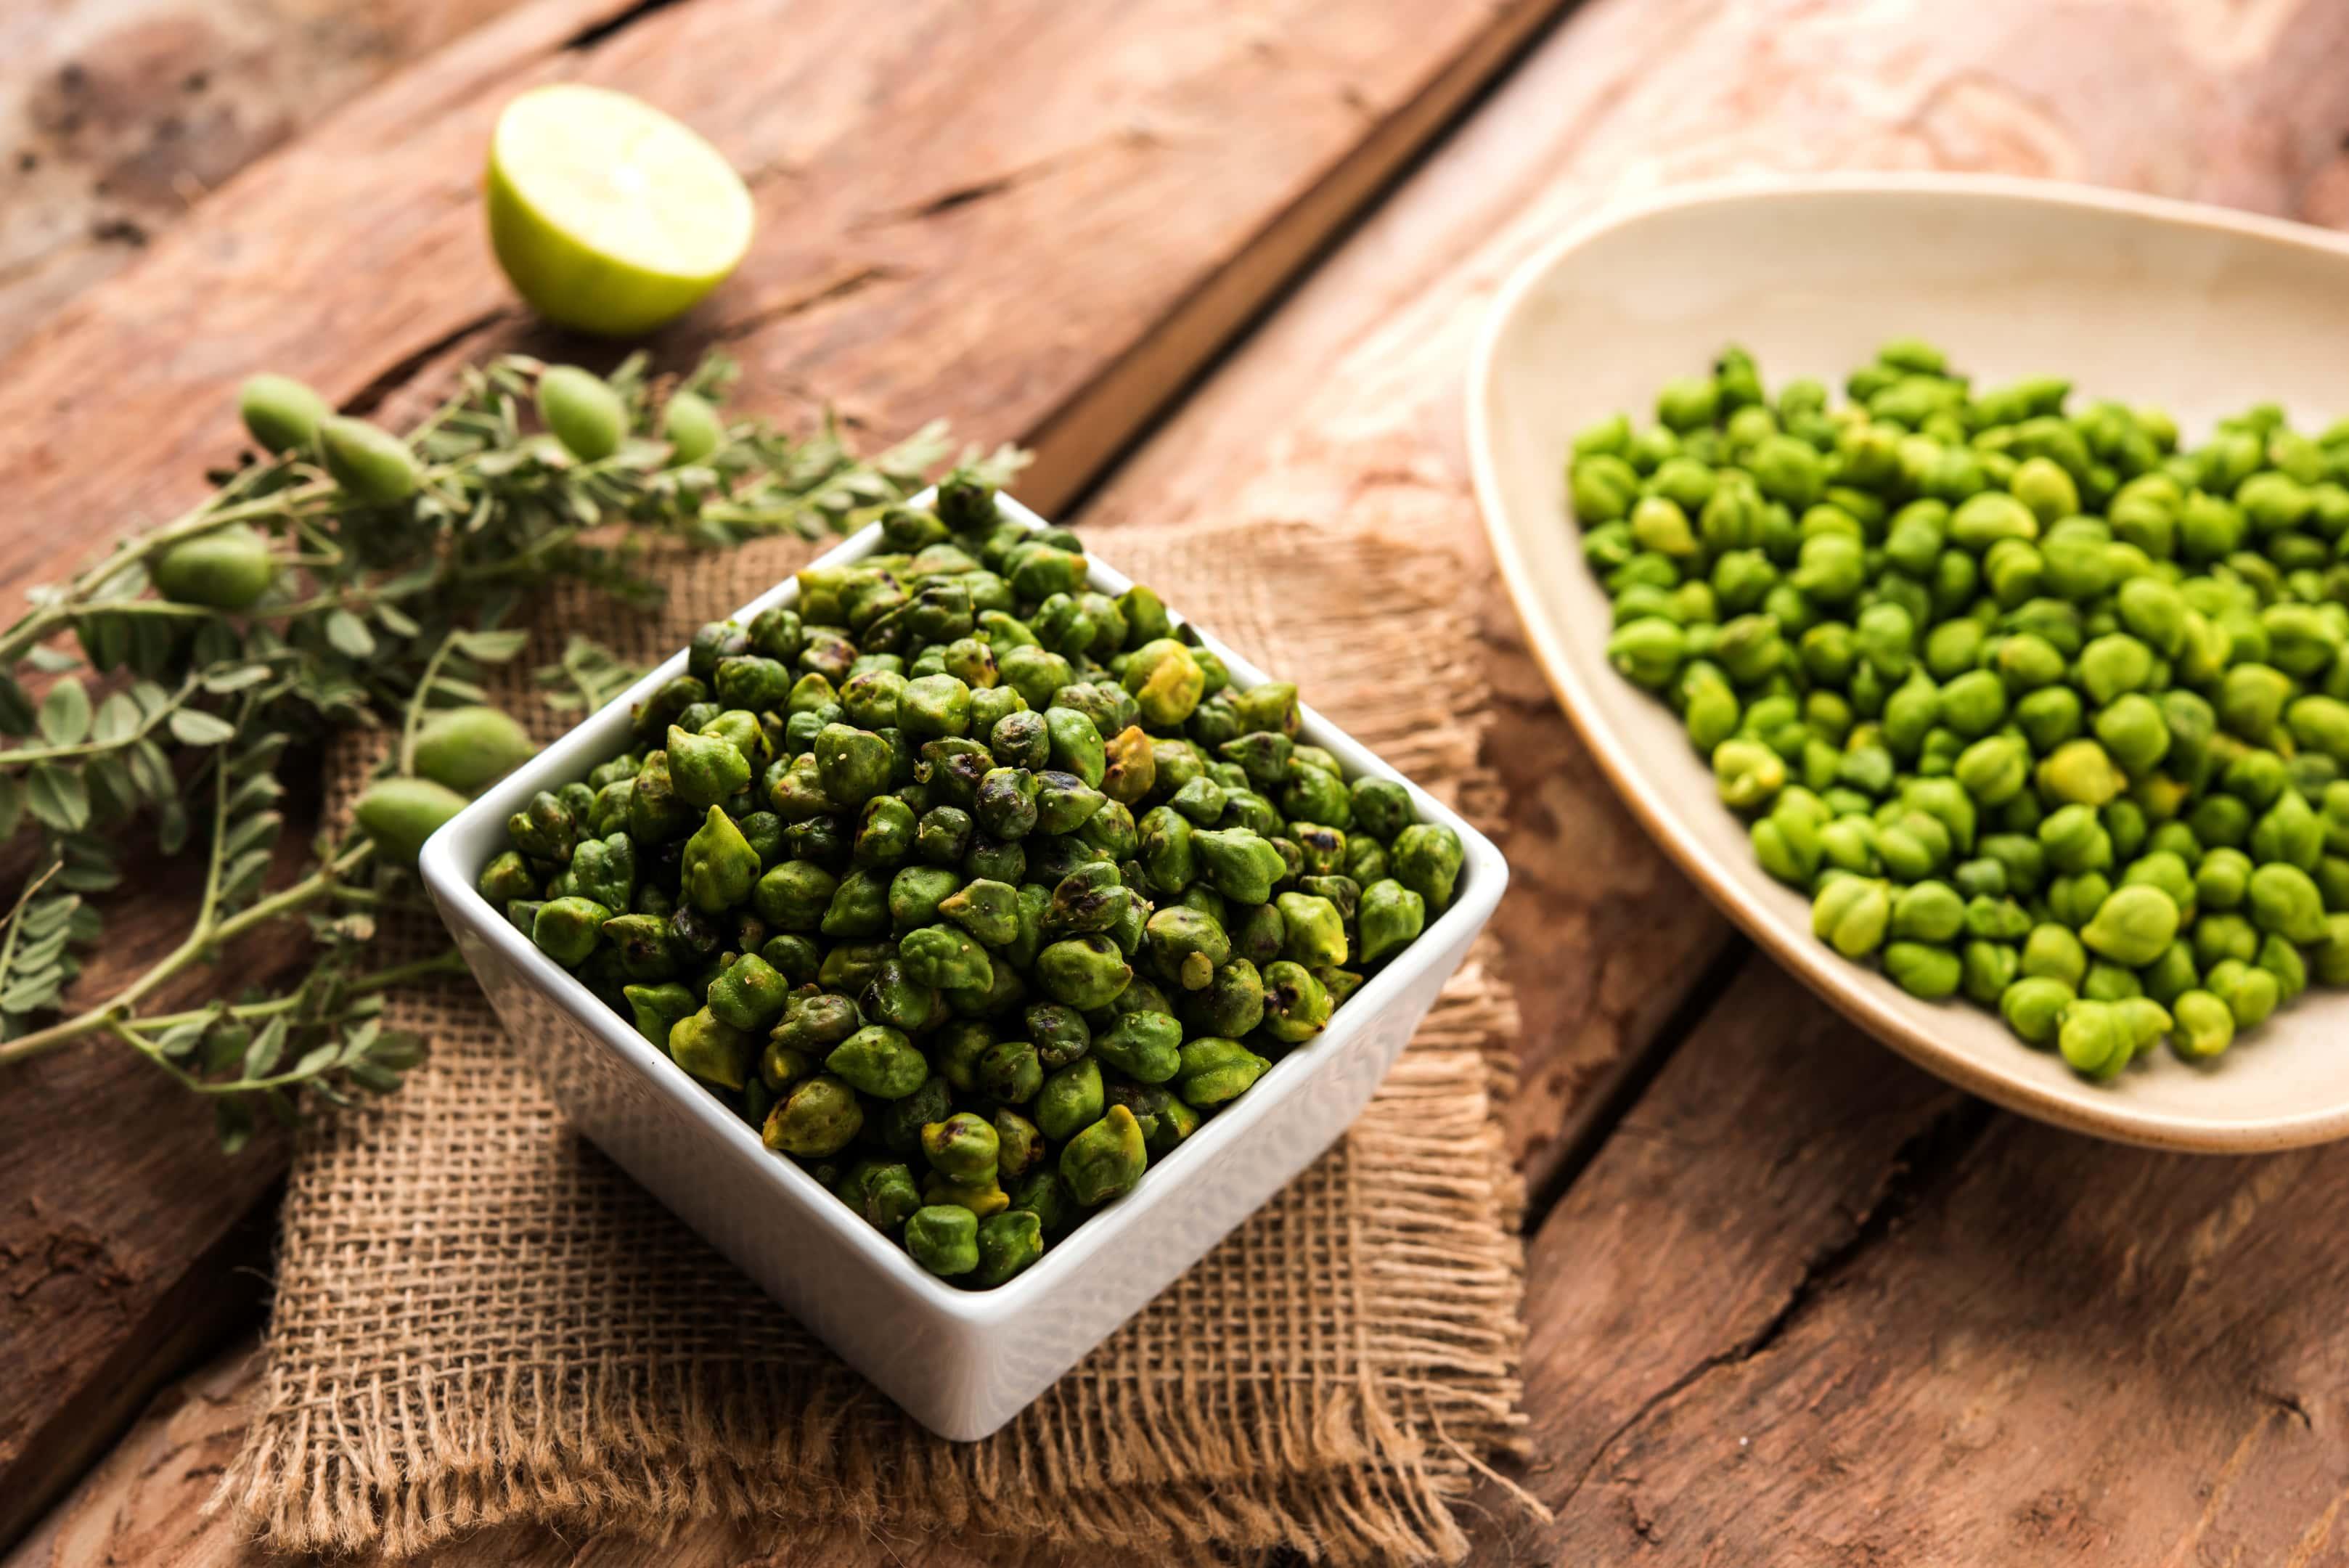 Roasted and fresh green chickpeas — Hara Harbara — in bowls